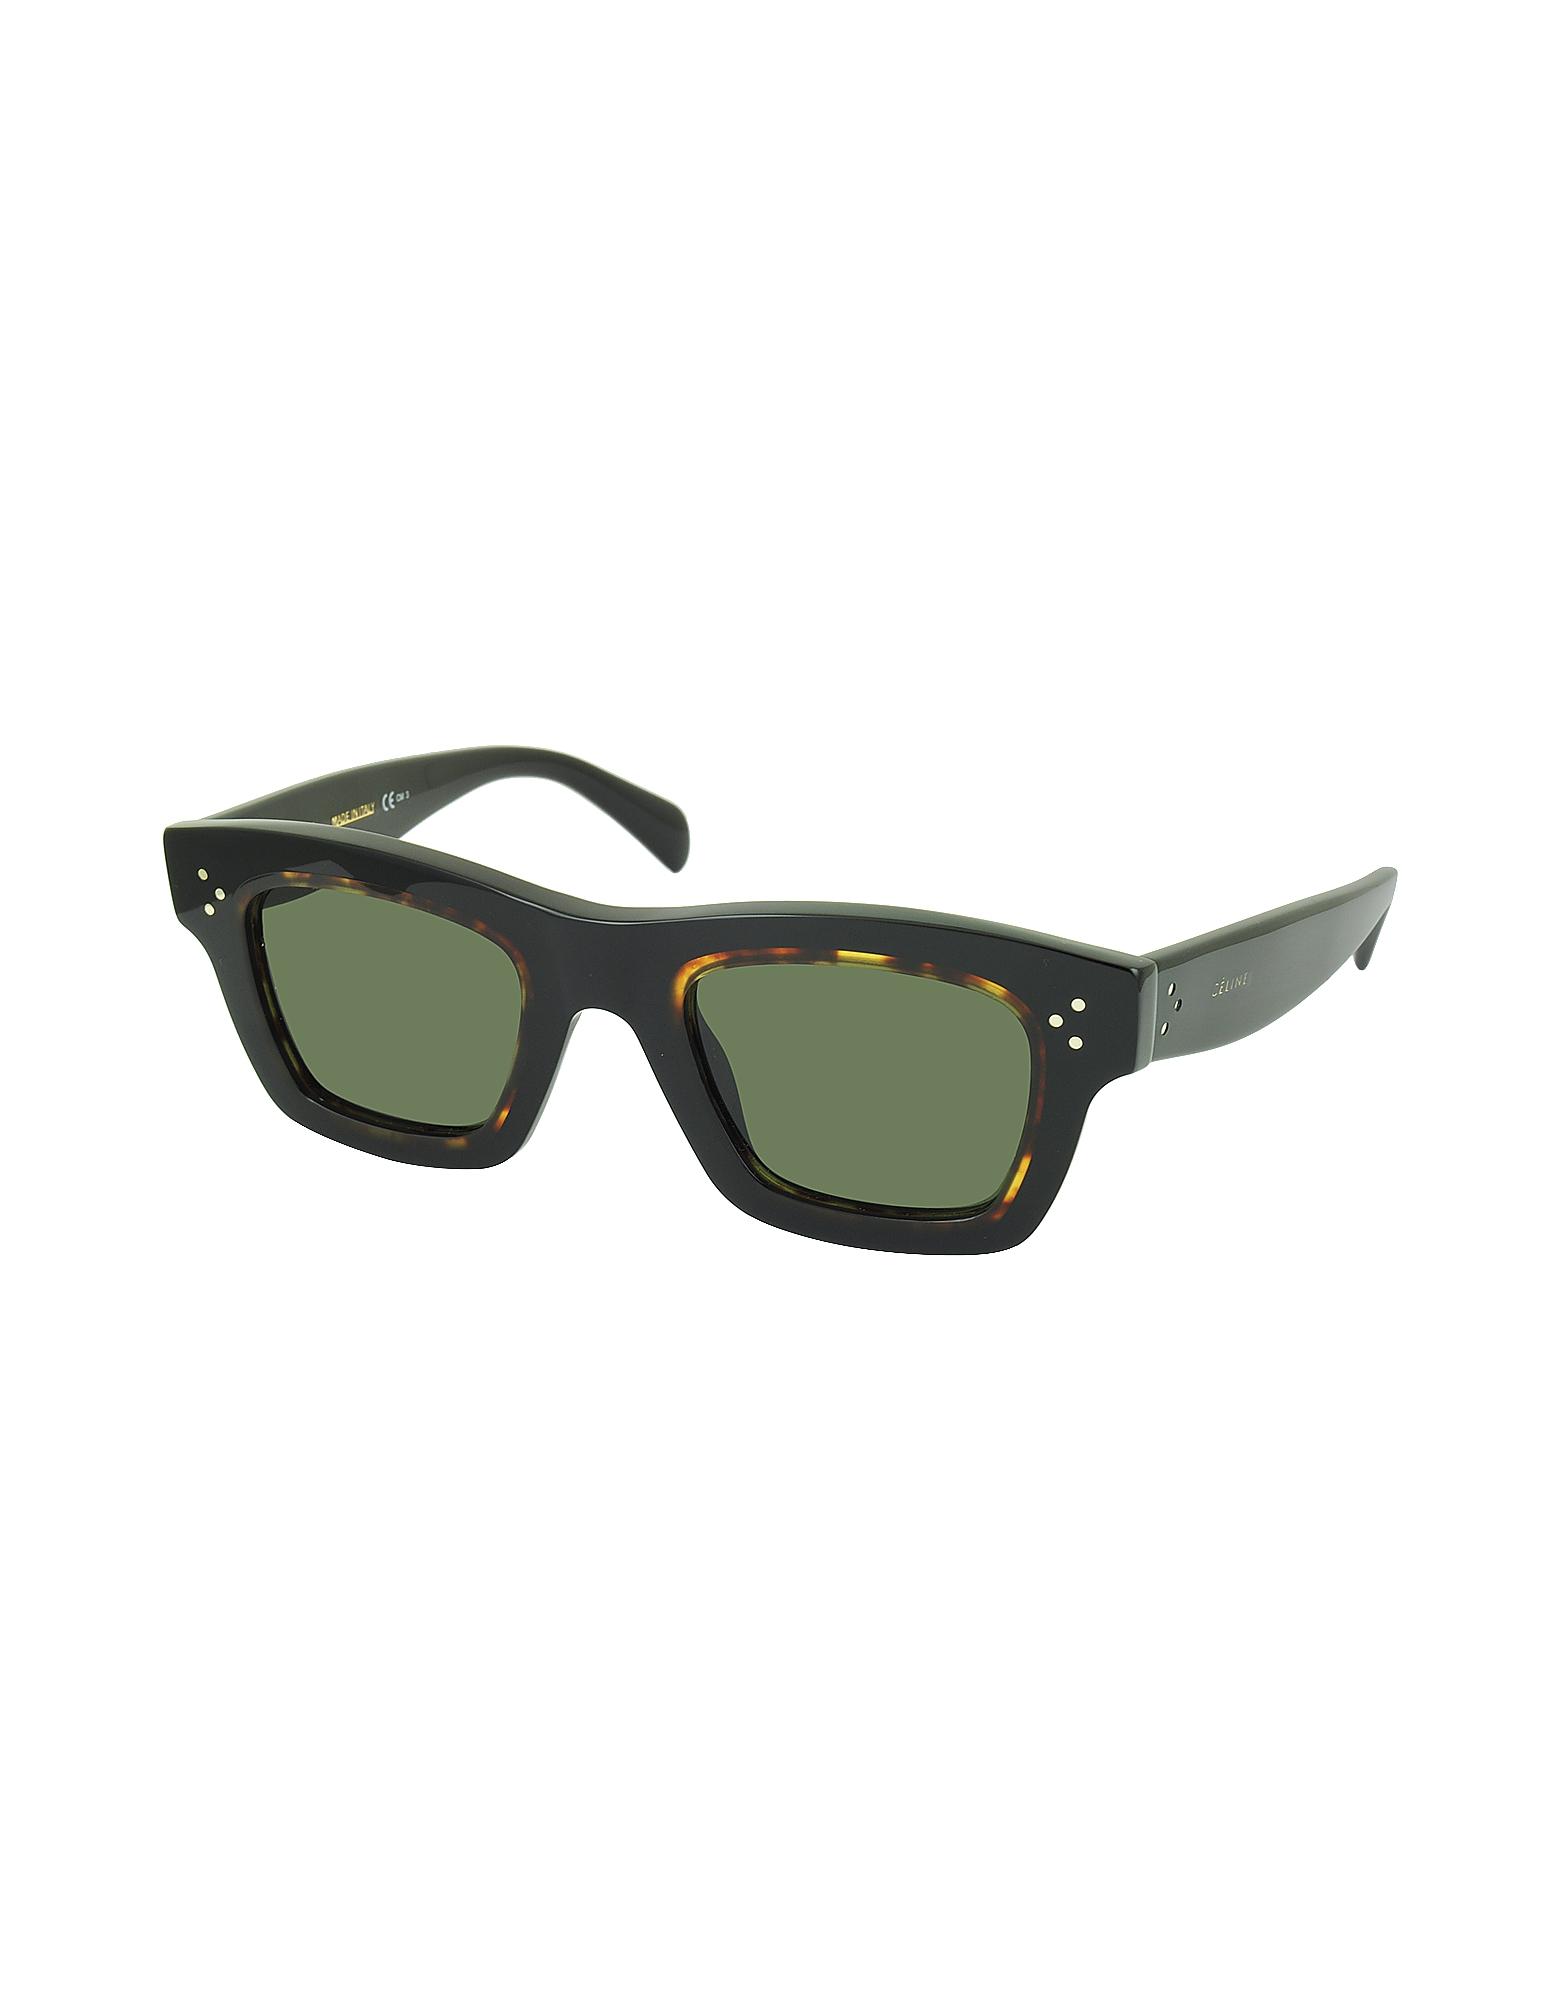 GABY CL 41396/S T7D70 Havana Acetate Square Frame Unisex Sunglasses от Forzieri.com INT